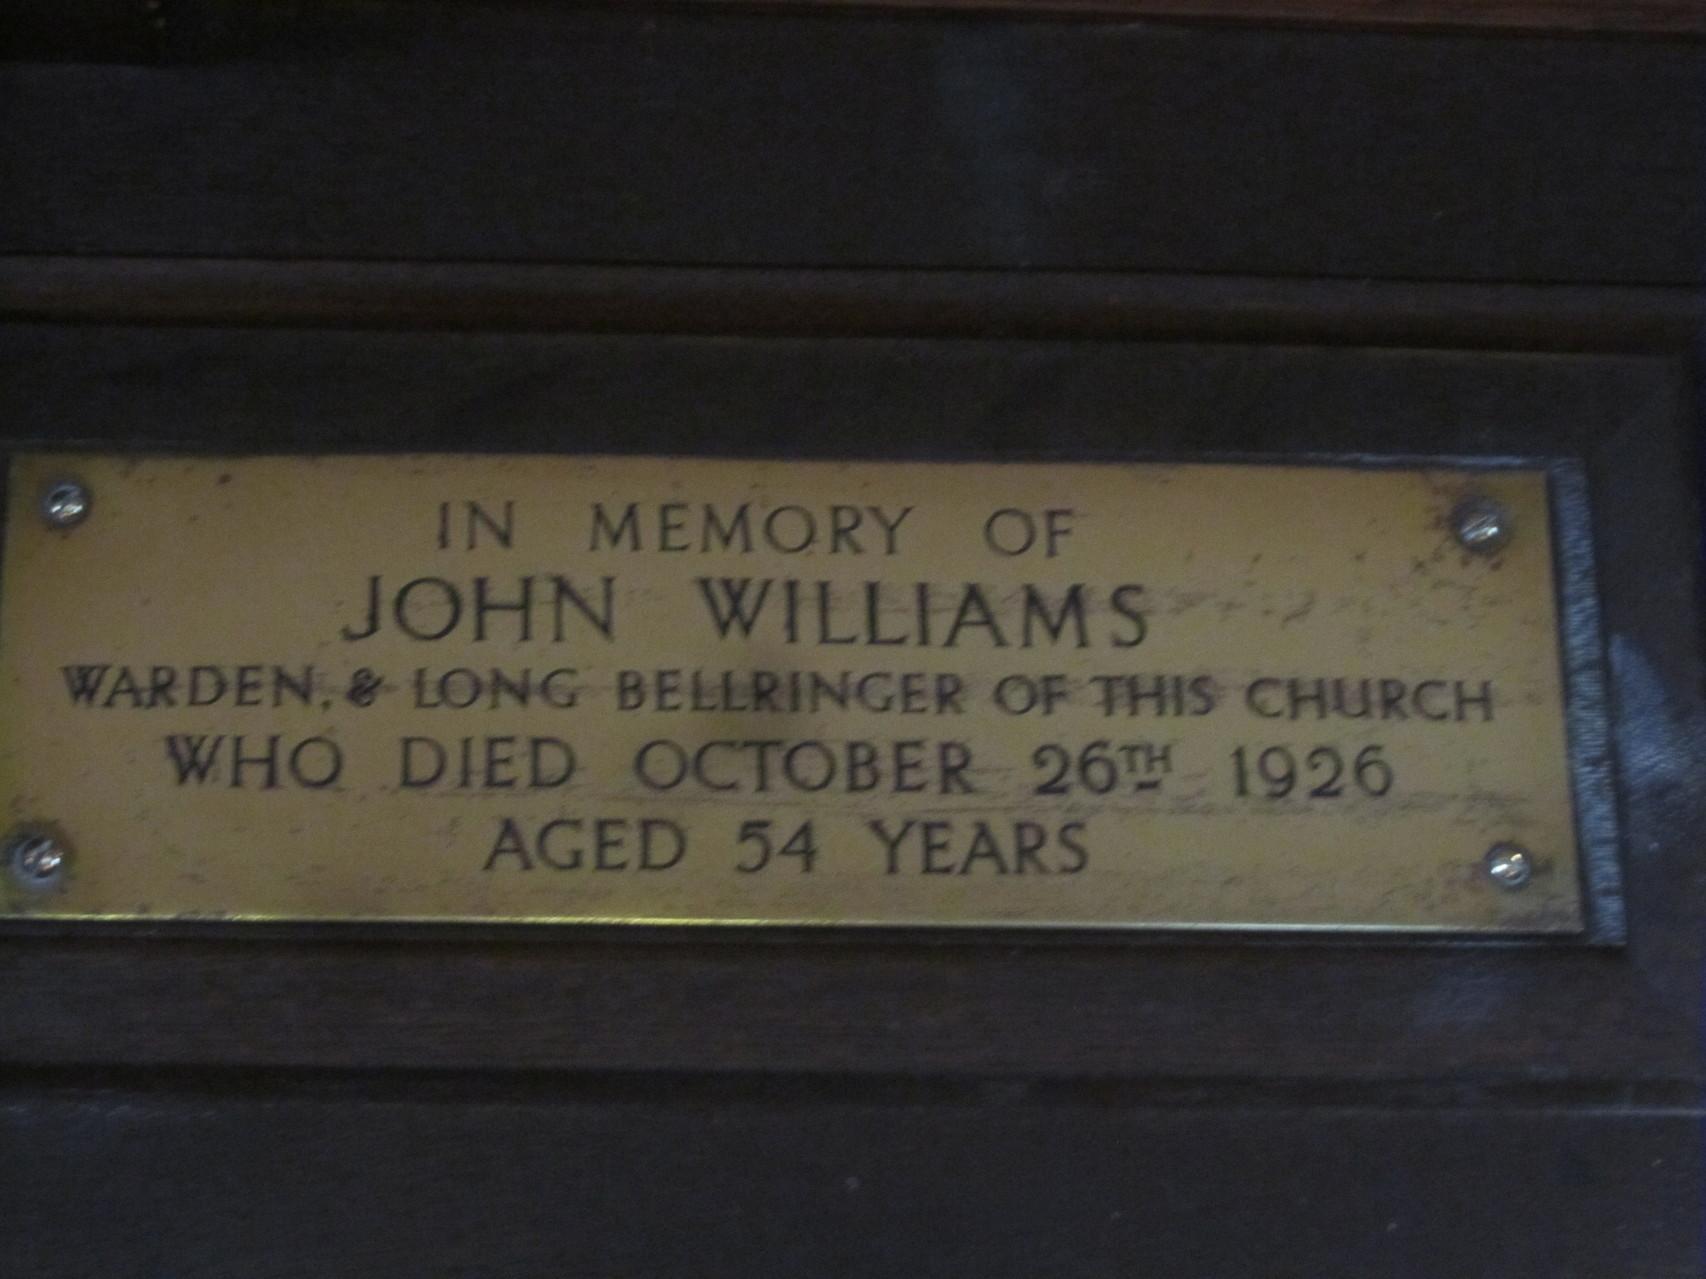 In memory of bellringer John Williams who died in 1926